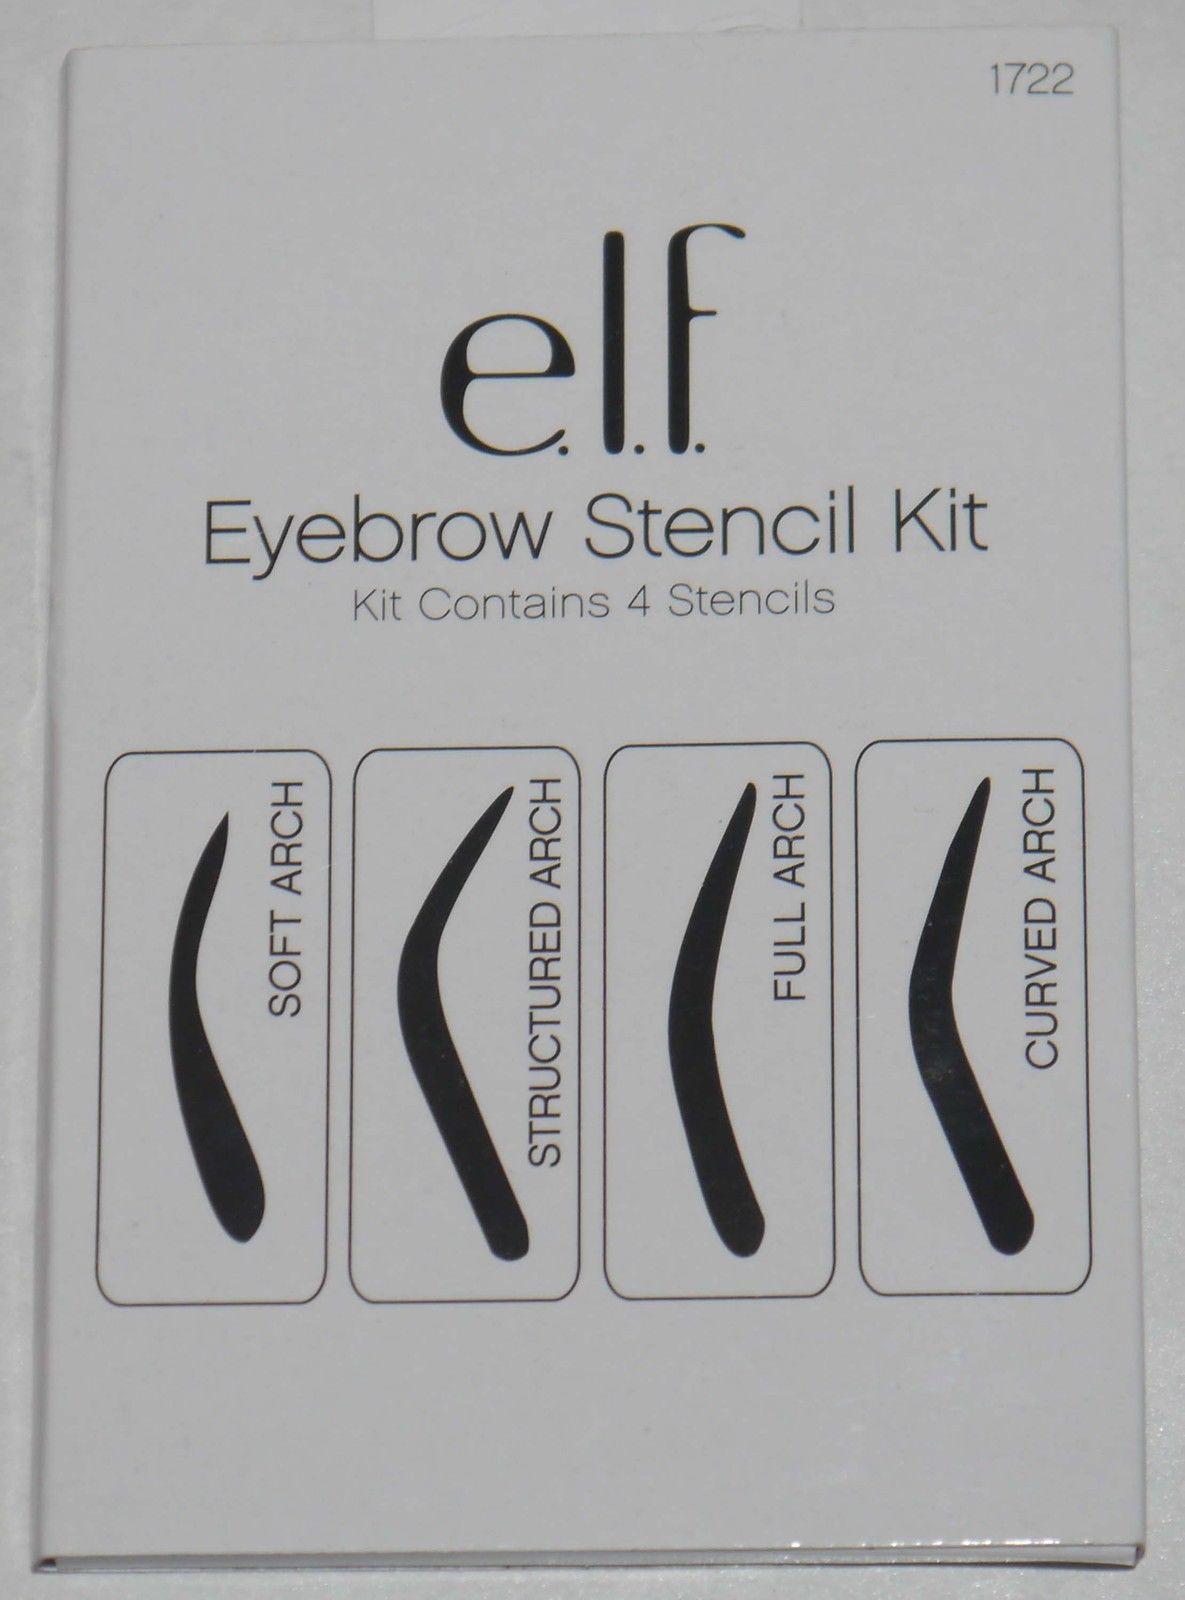 elf Cosmetics 4 Shapes Eyebrow Stencil Kit #1722 12667